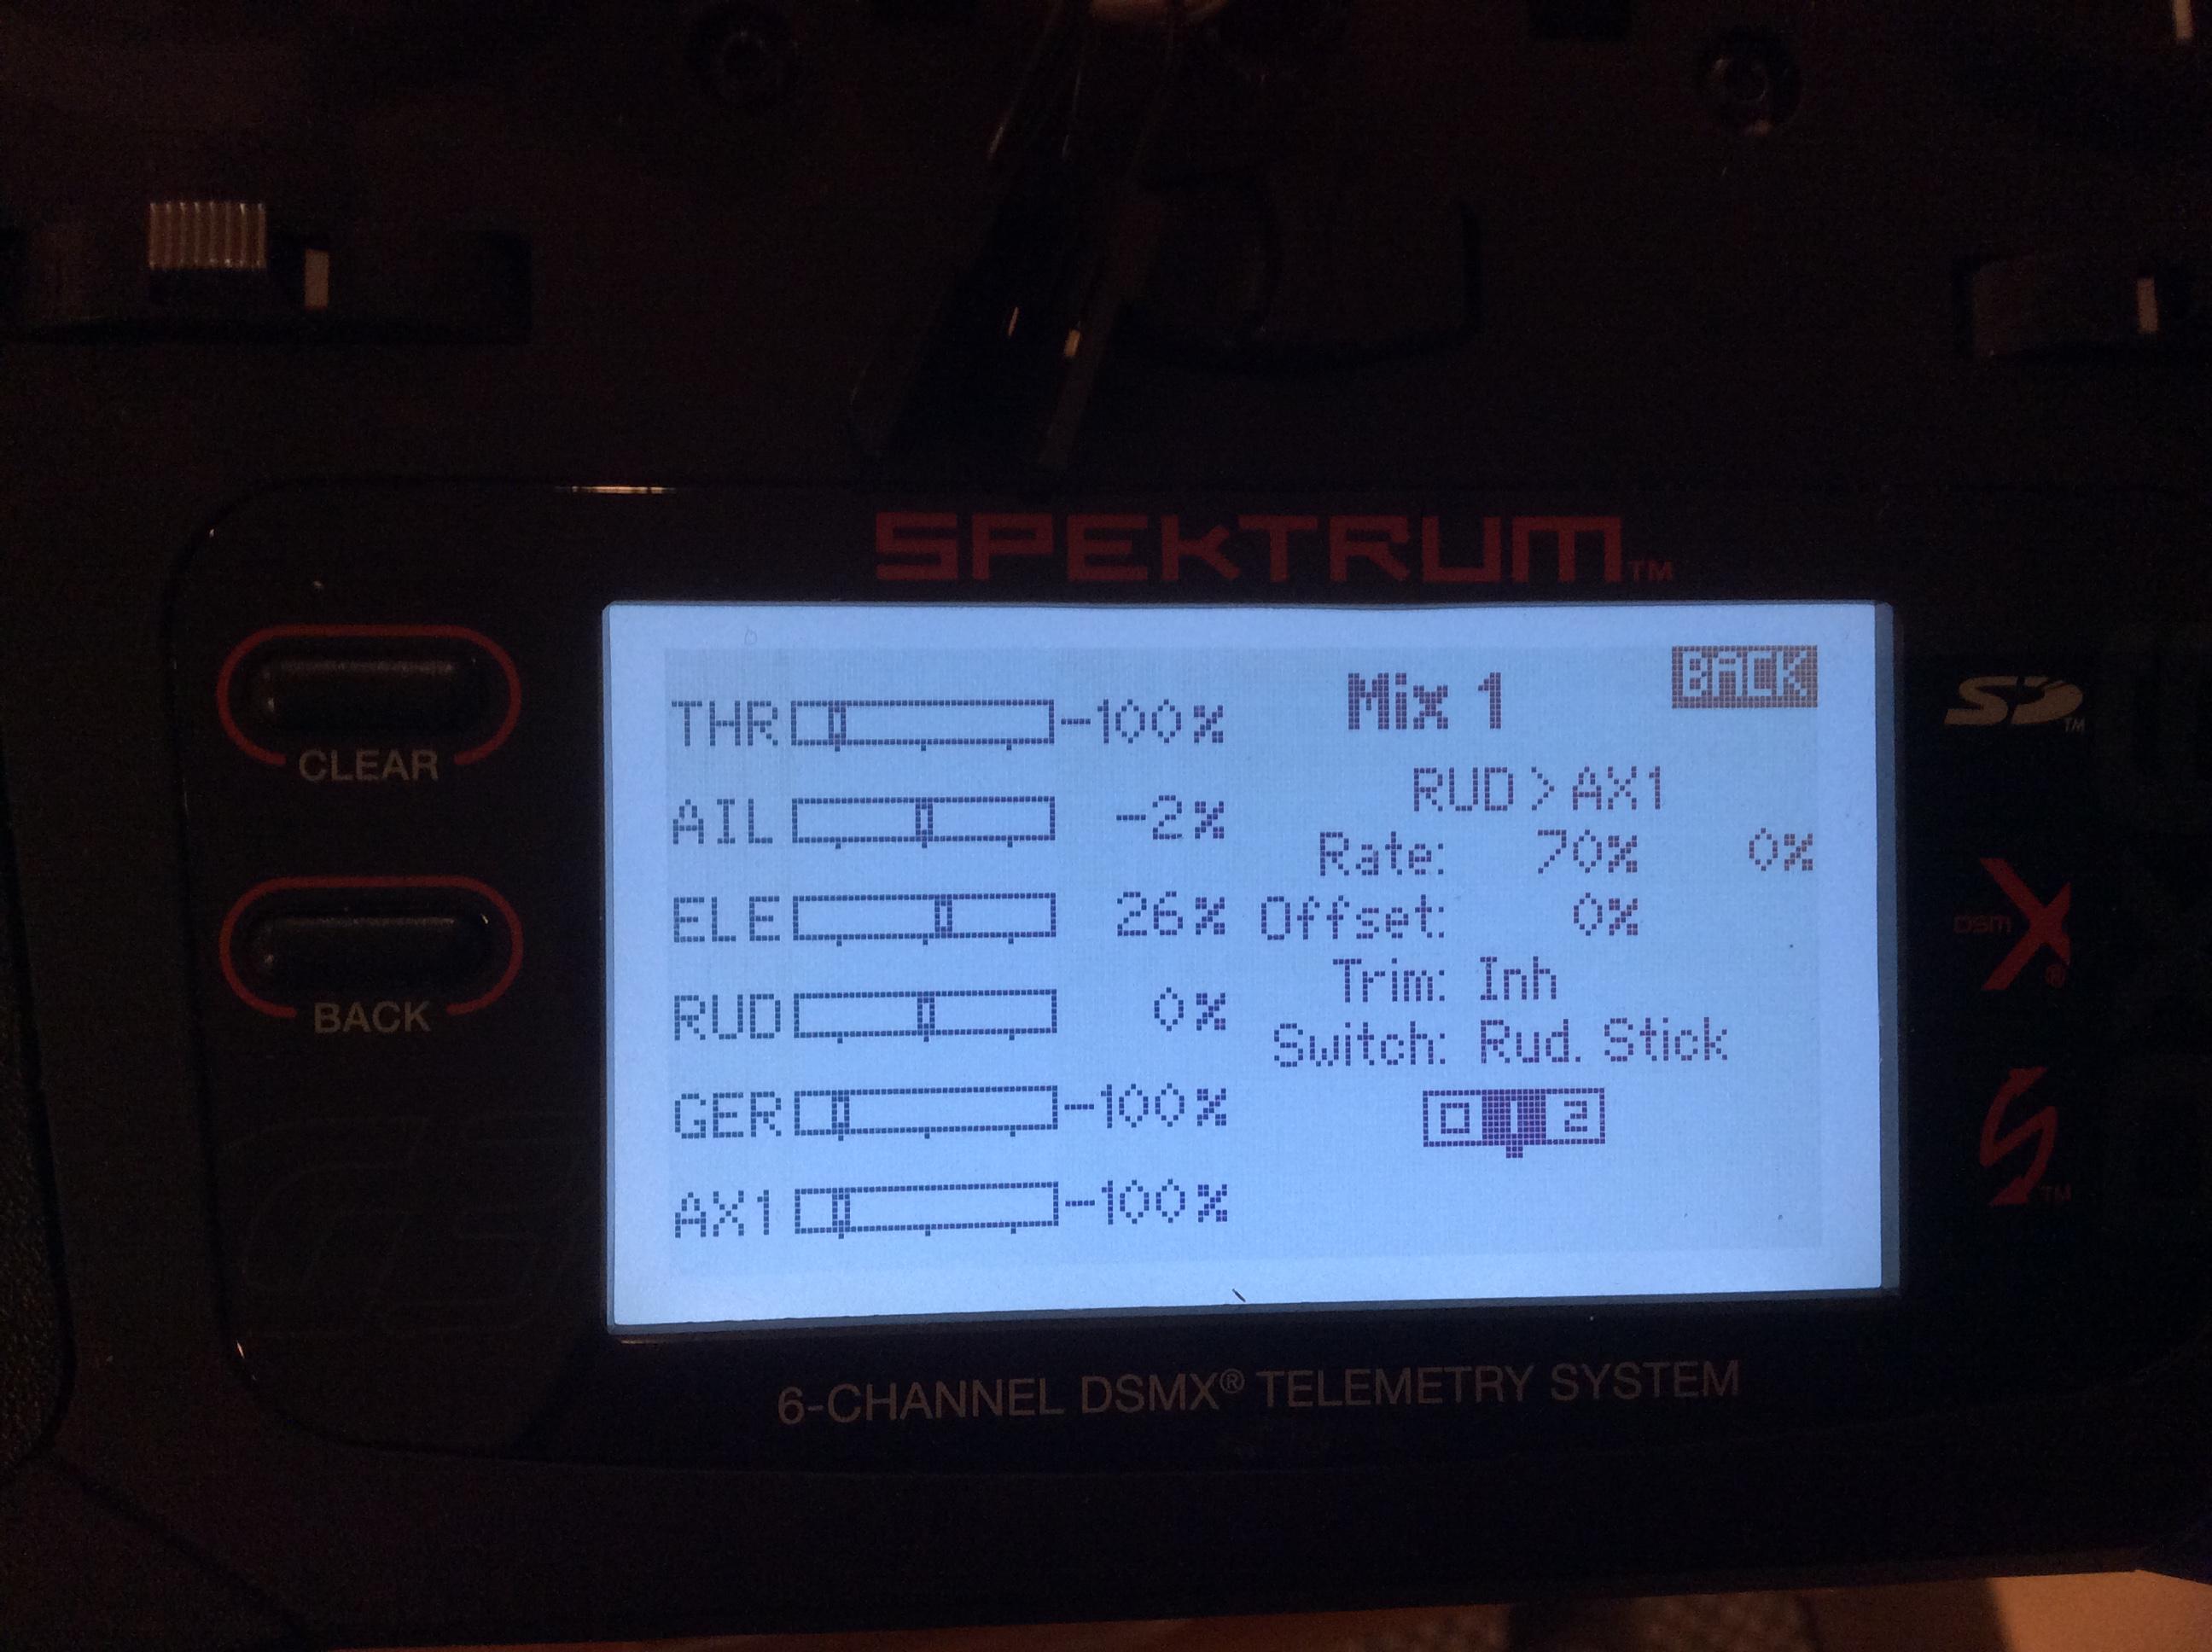 5BFA9555-90F7-4896-8BE9-A80281474E20.jpeg